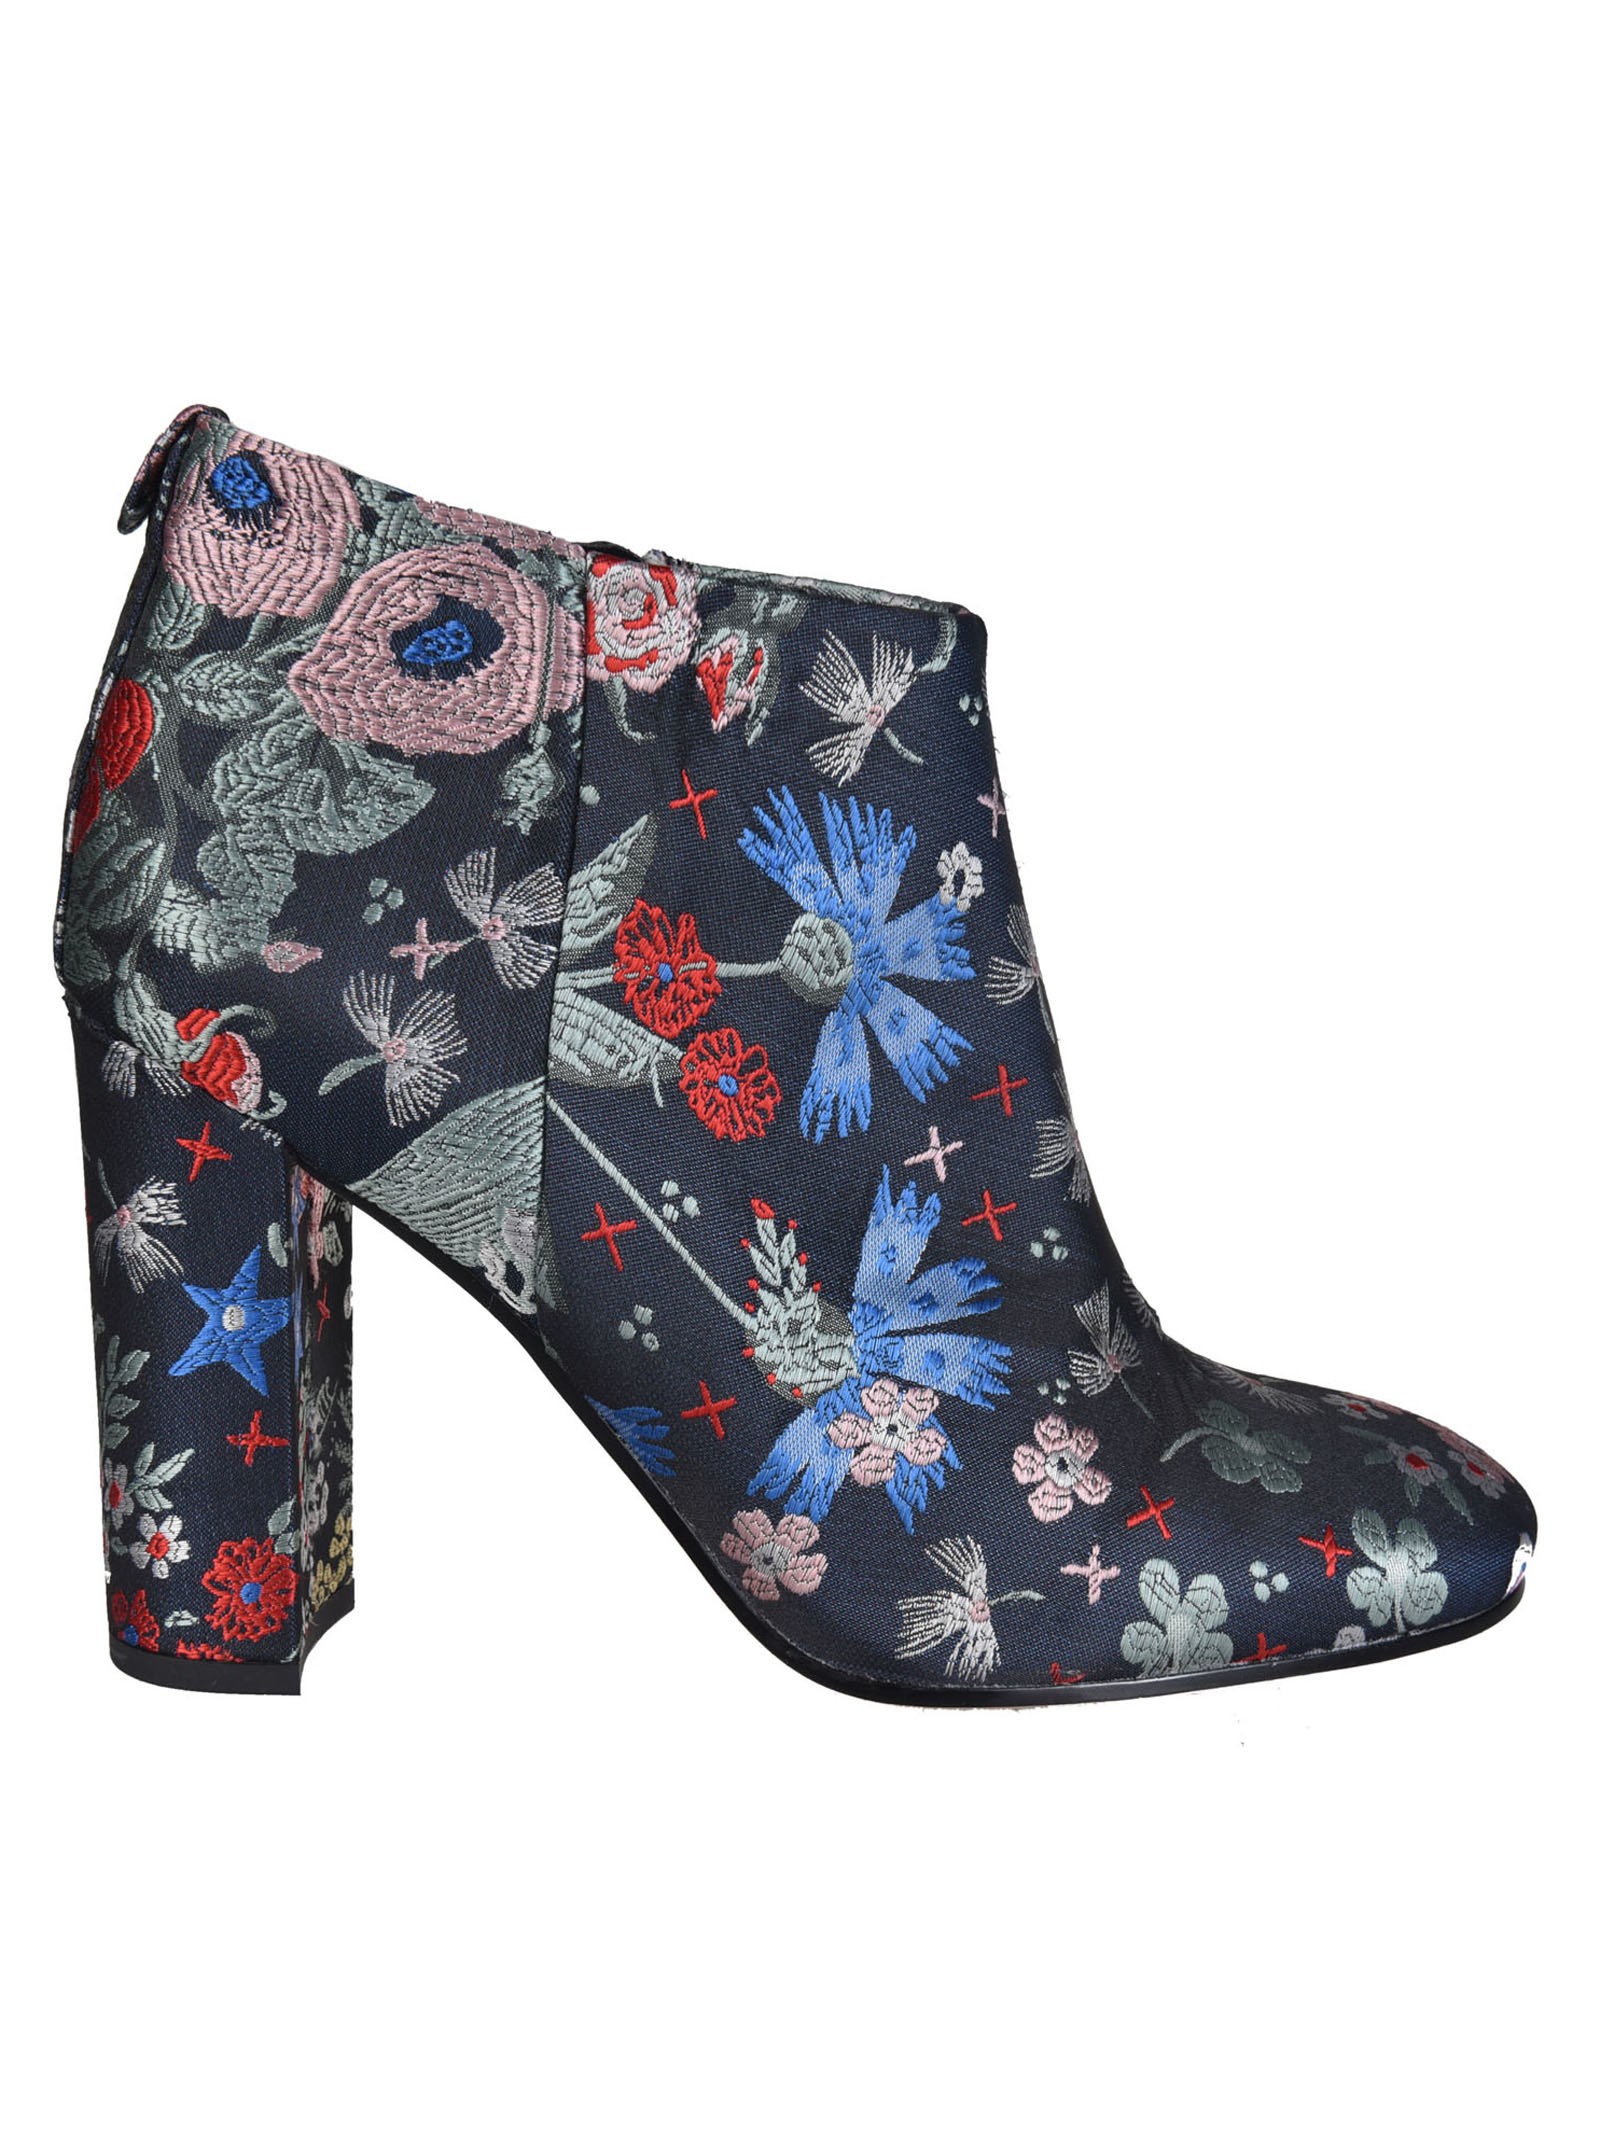 Sam Edelman Cambell Ankle Boots - Sam Edelman - Click